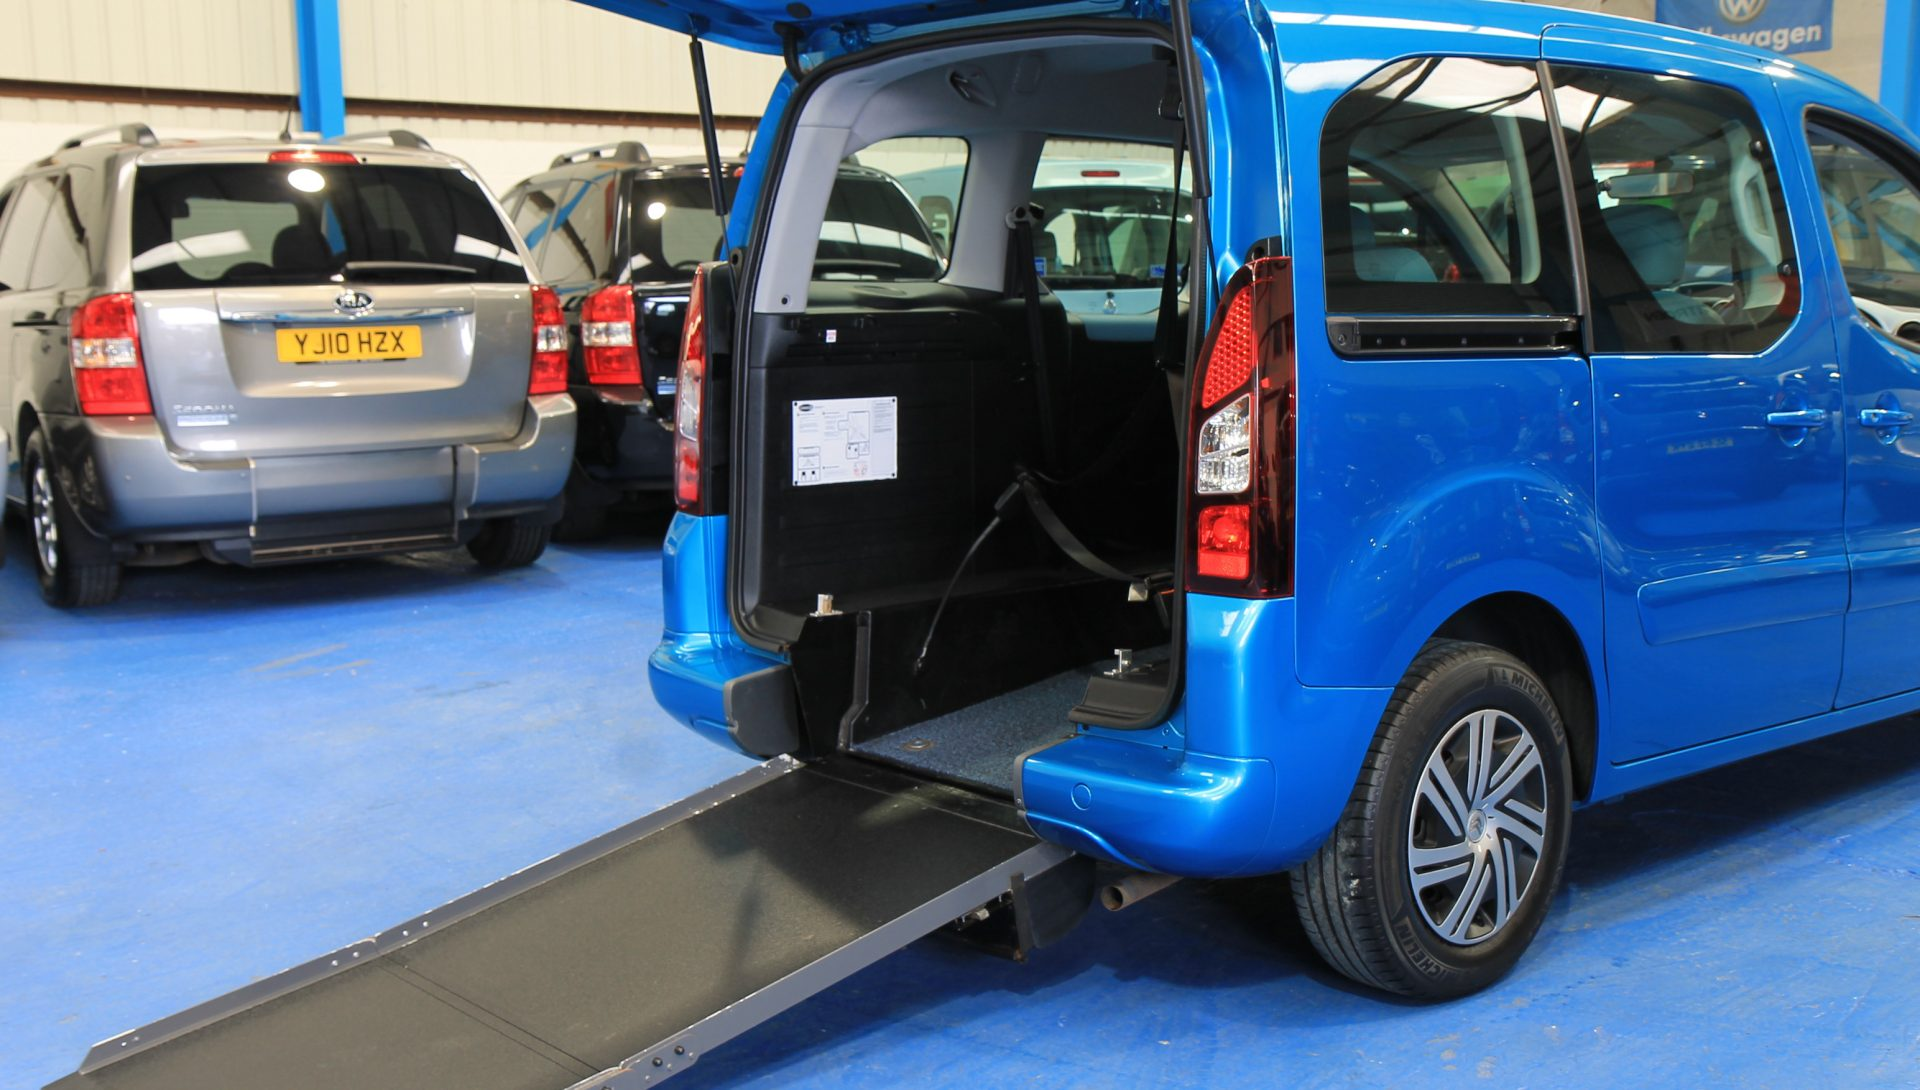 Berlingo Wheelchair access vehicle sn63jzn